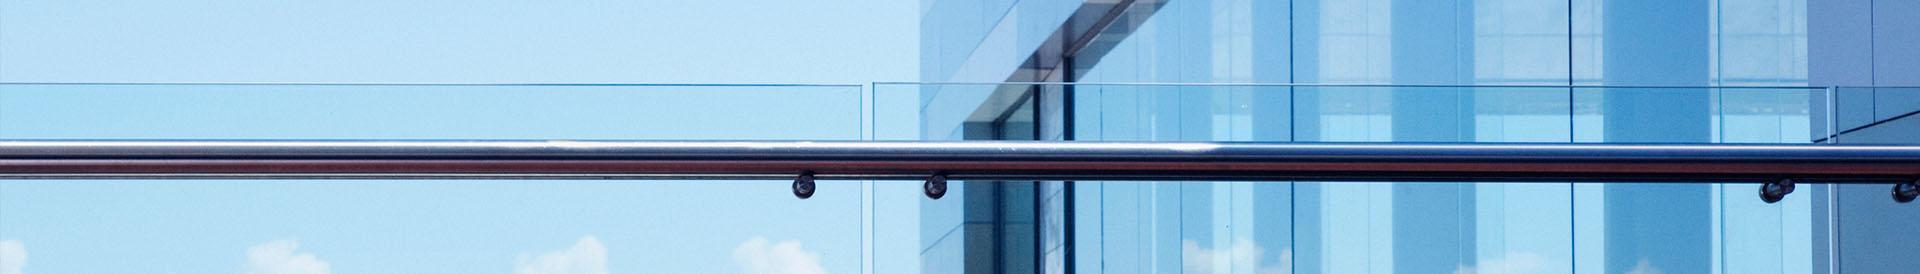 szklana balustrada - Banner